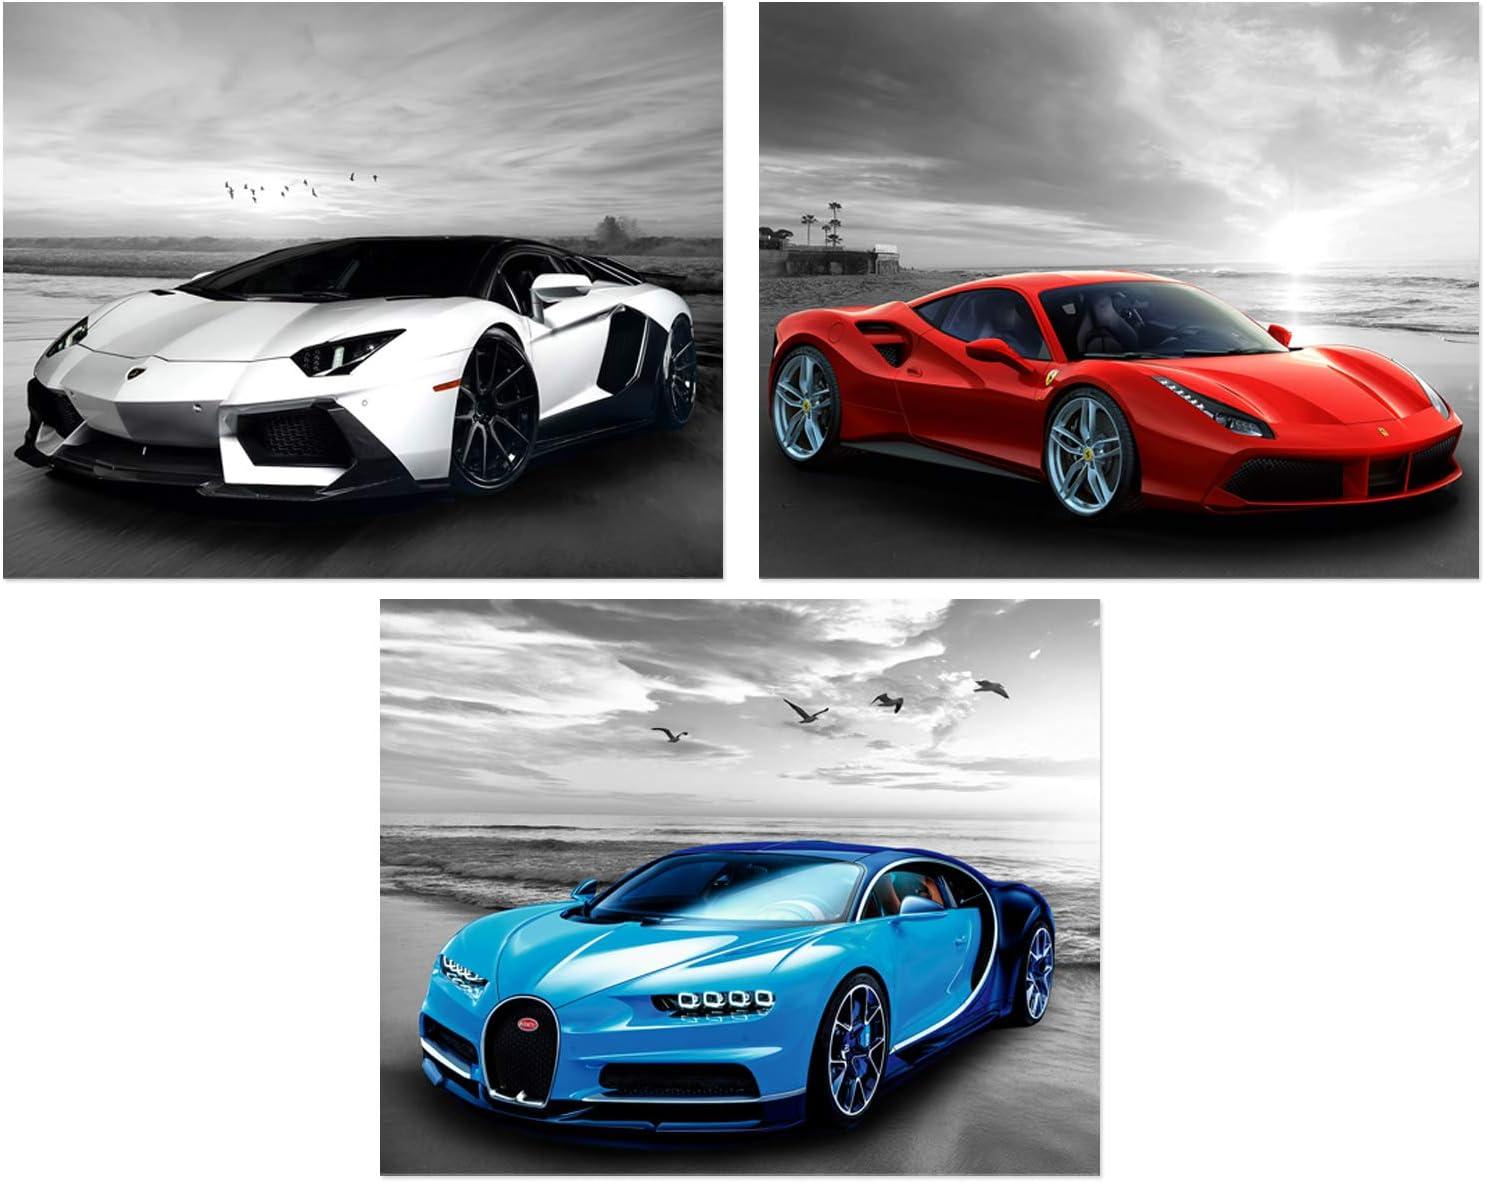 Car Posters - Ferrari, Mclaren, Lamborghini Sports Car Wall Art - Exotic Supercar Decor Set of 3 Unframed (10x8 inches) Supercars Pictures - Geryscale Beach Theme - Set 2